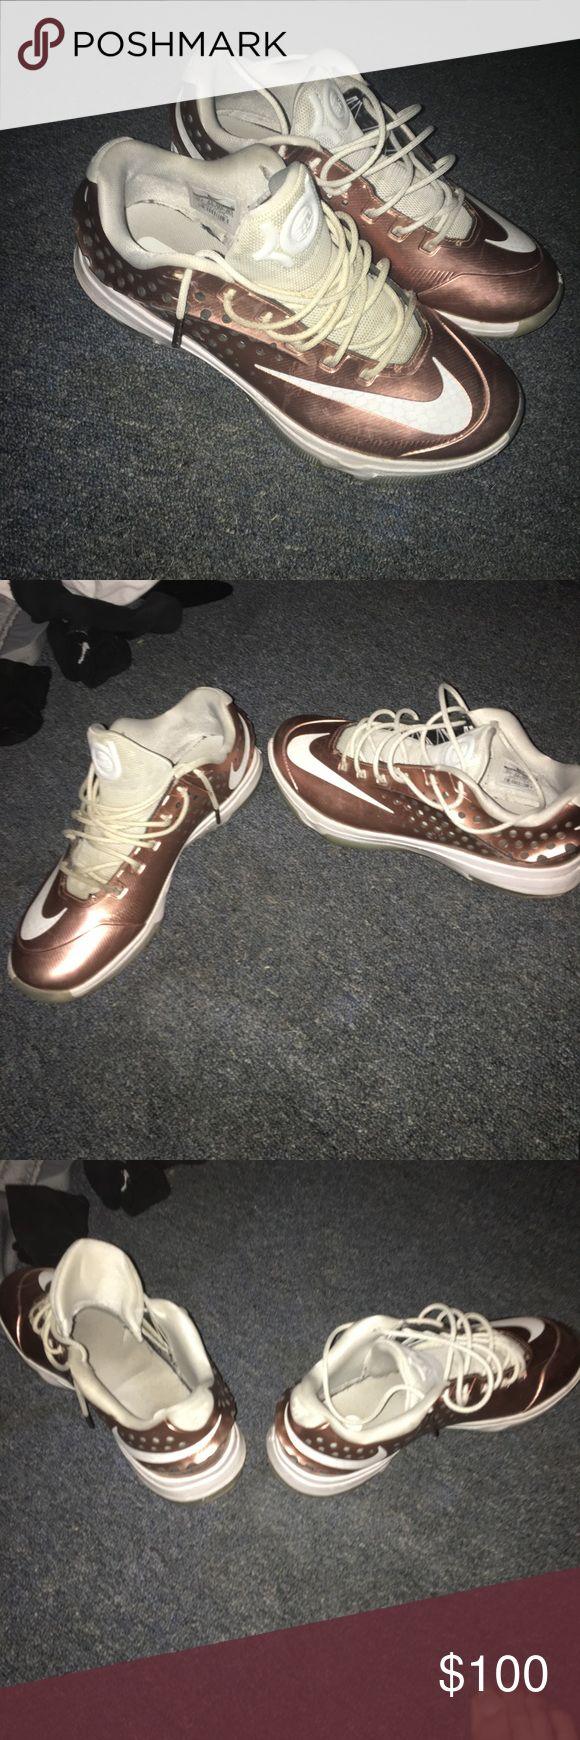 Selling this Nike KD 7 VII EYBL Copper Size 10.5 Copper on Poshmark! My username is: apassafiume1. #shopmycloset #poshmark #fashion #shopping #style #forsale #Nike #Other